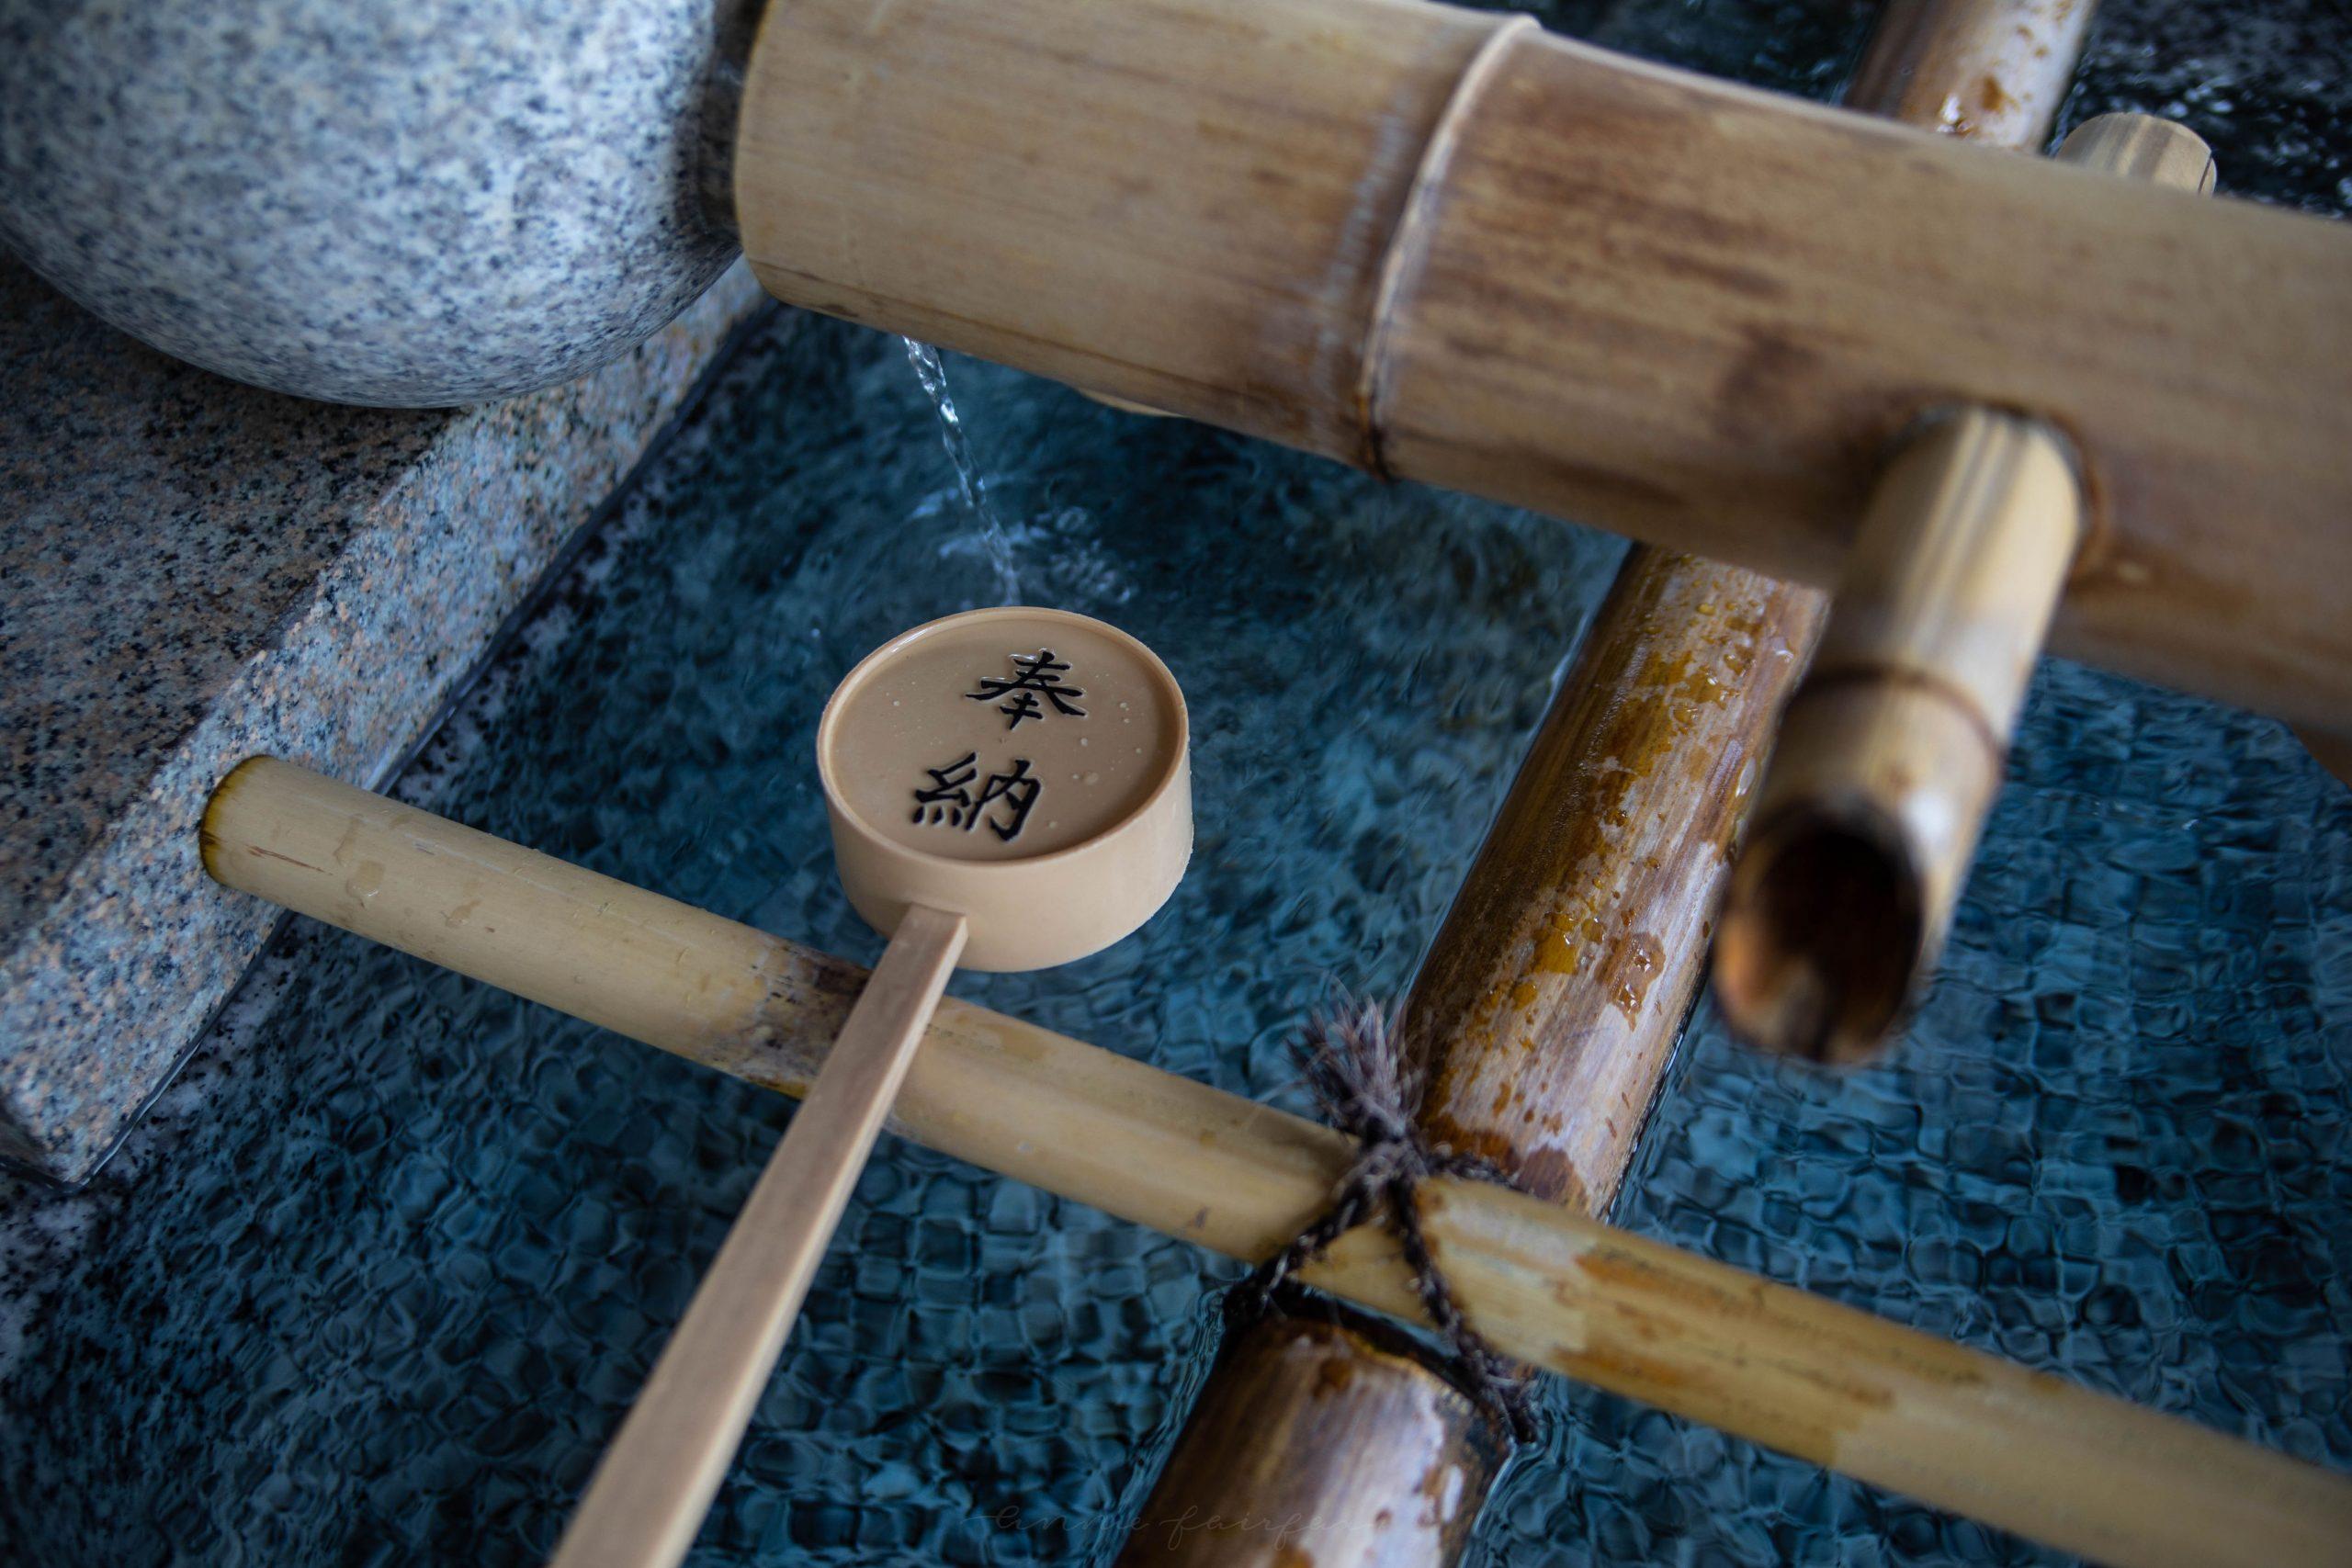 Temizuya Chozuya Shinto Shrine Purification Ablution Water Cleansing Ritual Photographed by Annie Fairfax